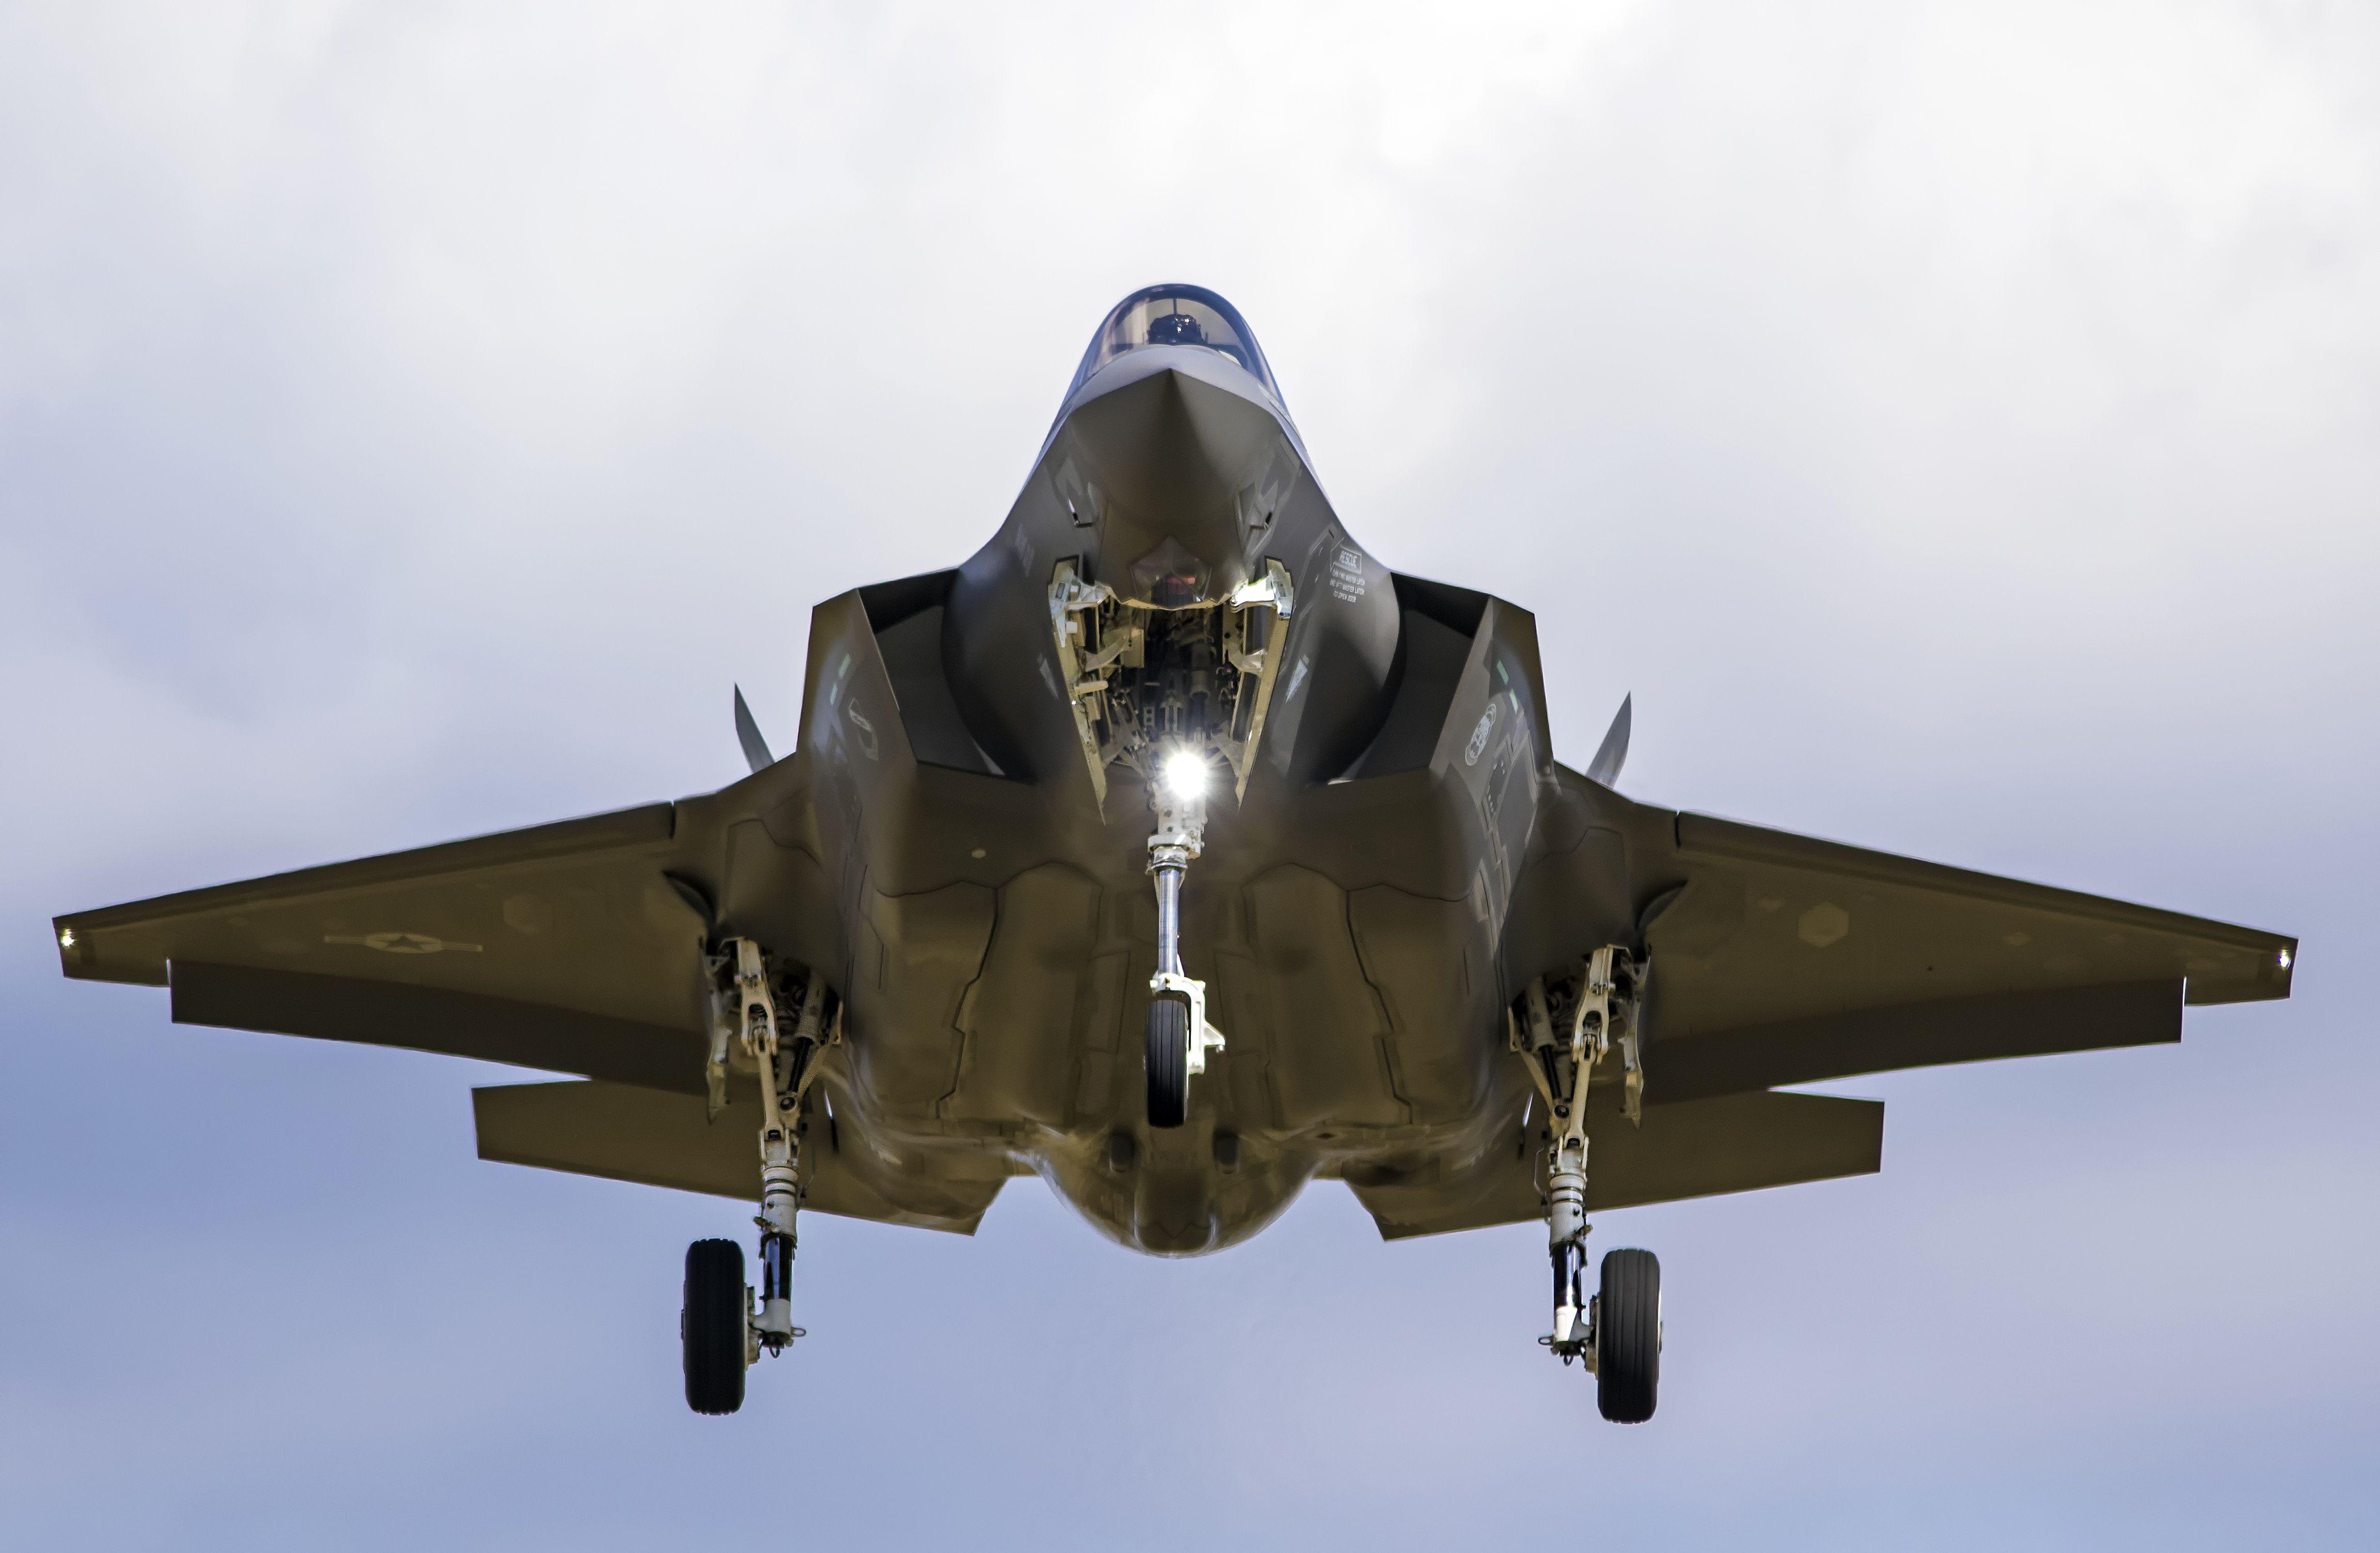 General 4604x3004 military aircraft vehicle military aircraft